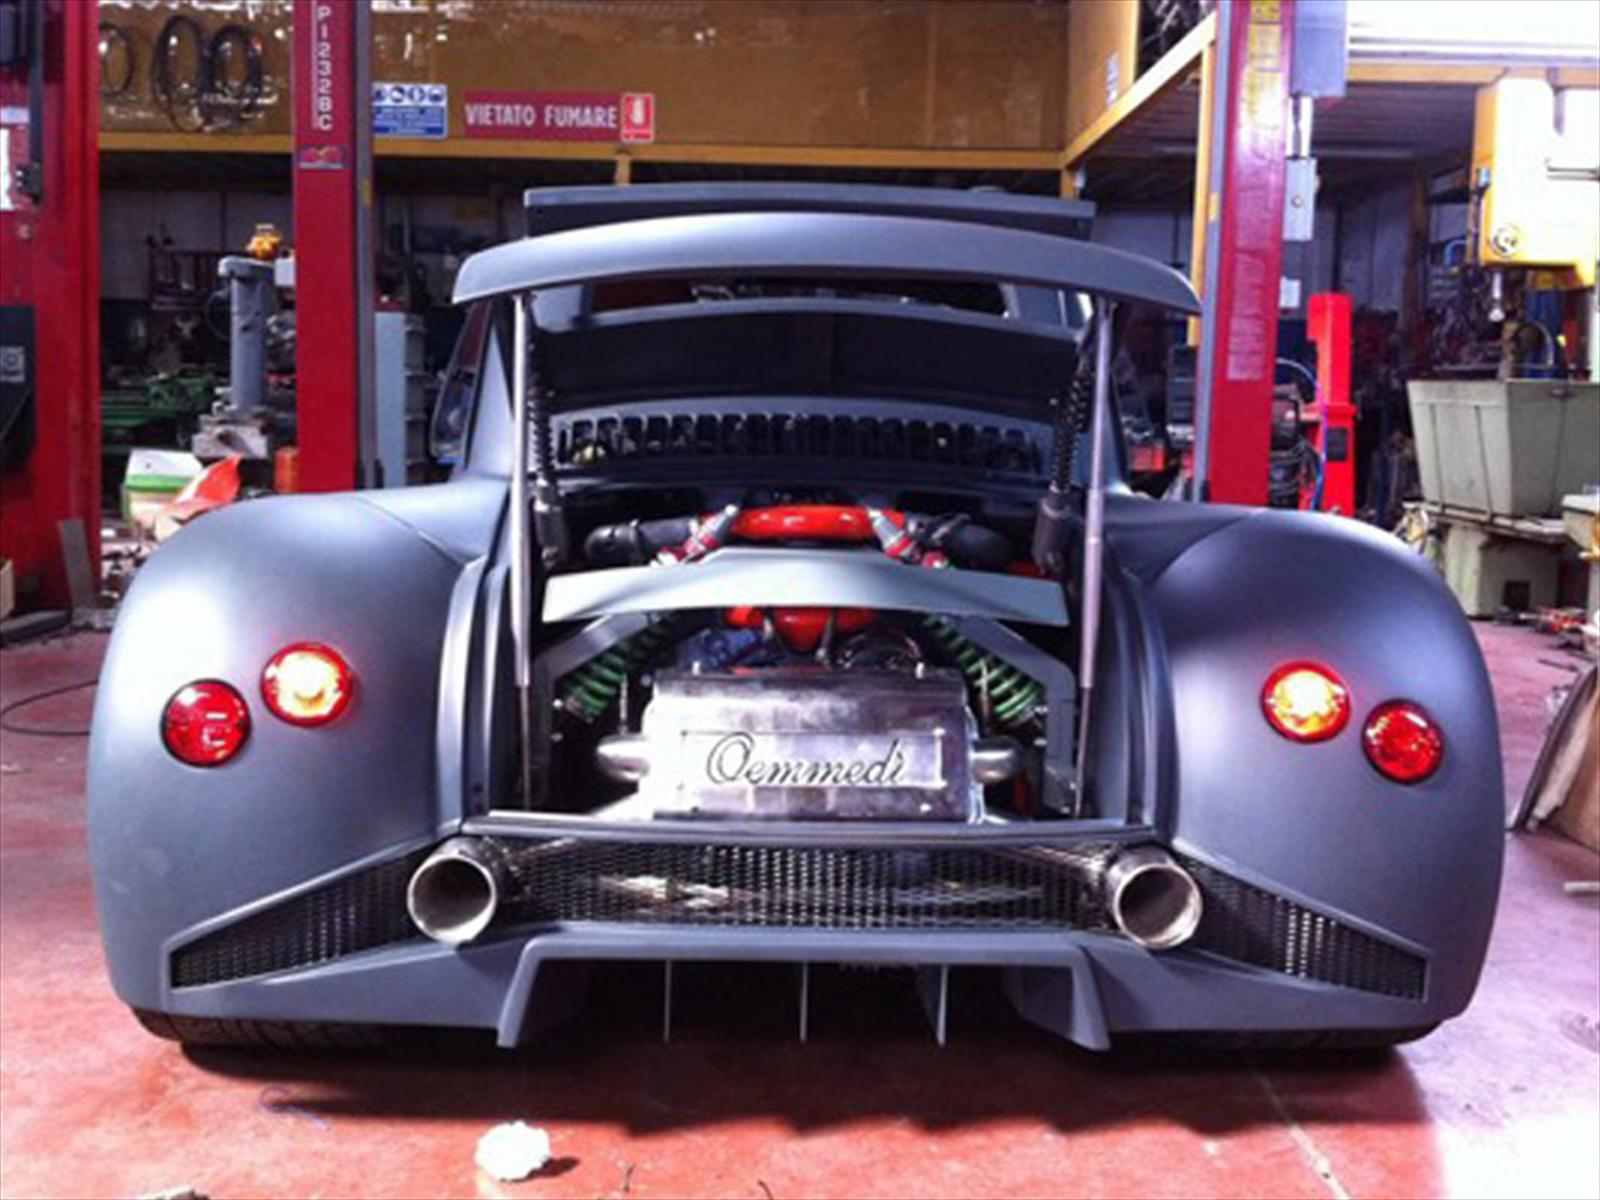 Gaz A Ad F Ba A E C Bb B on Fiat 500 Lamborghini V12 Engine